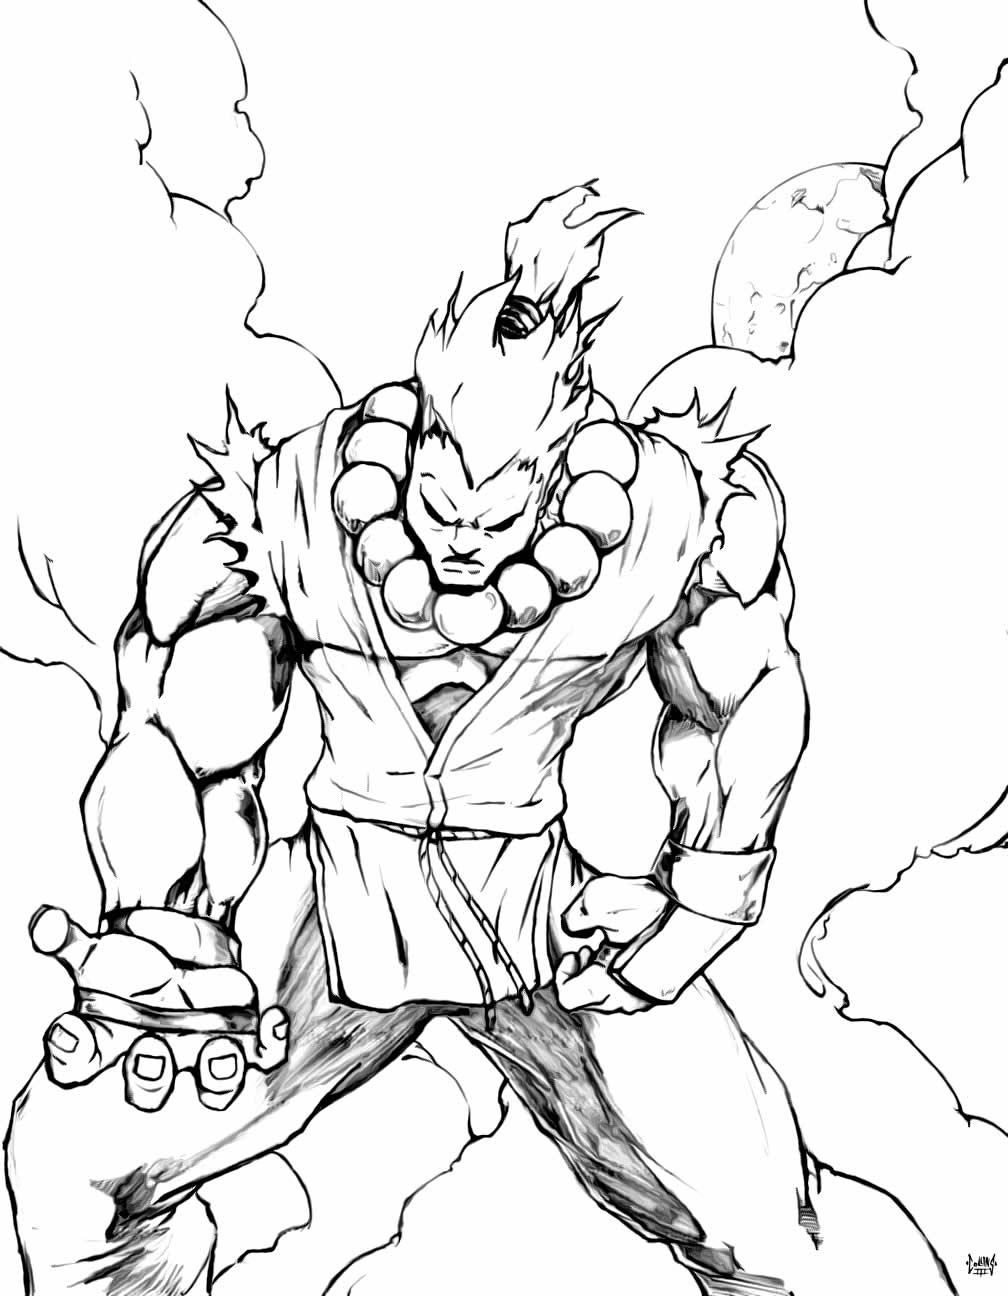 Imagem de Street Fighter para colorir